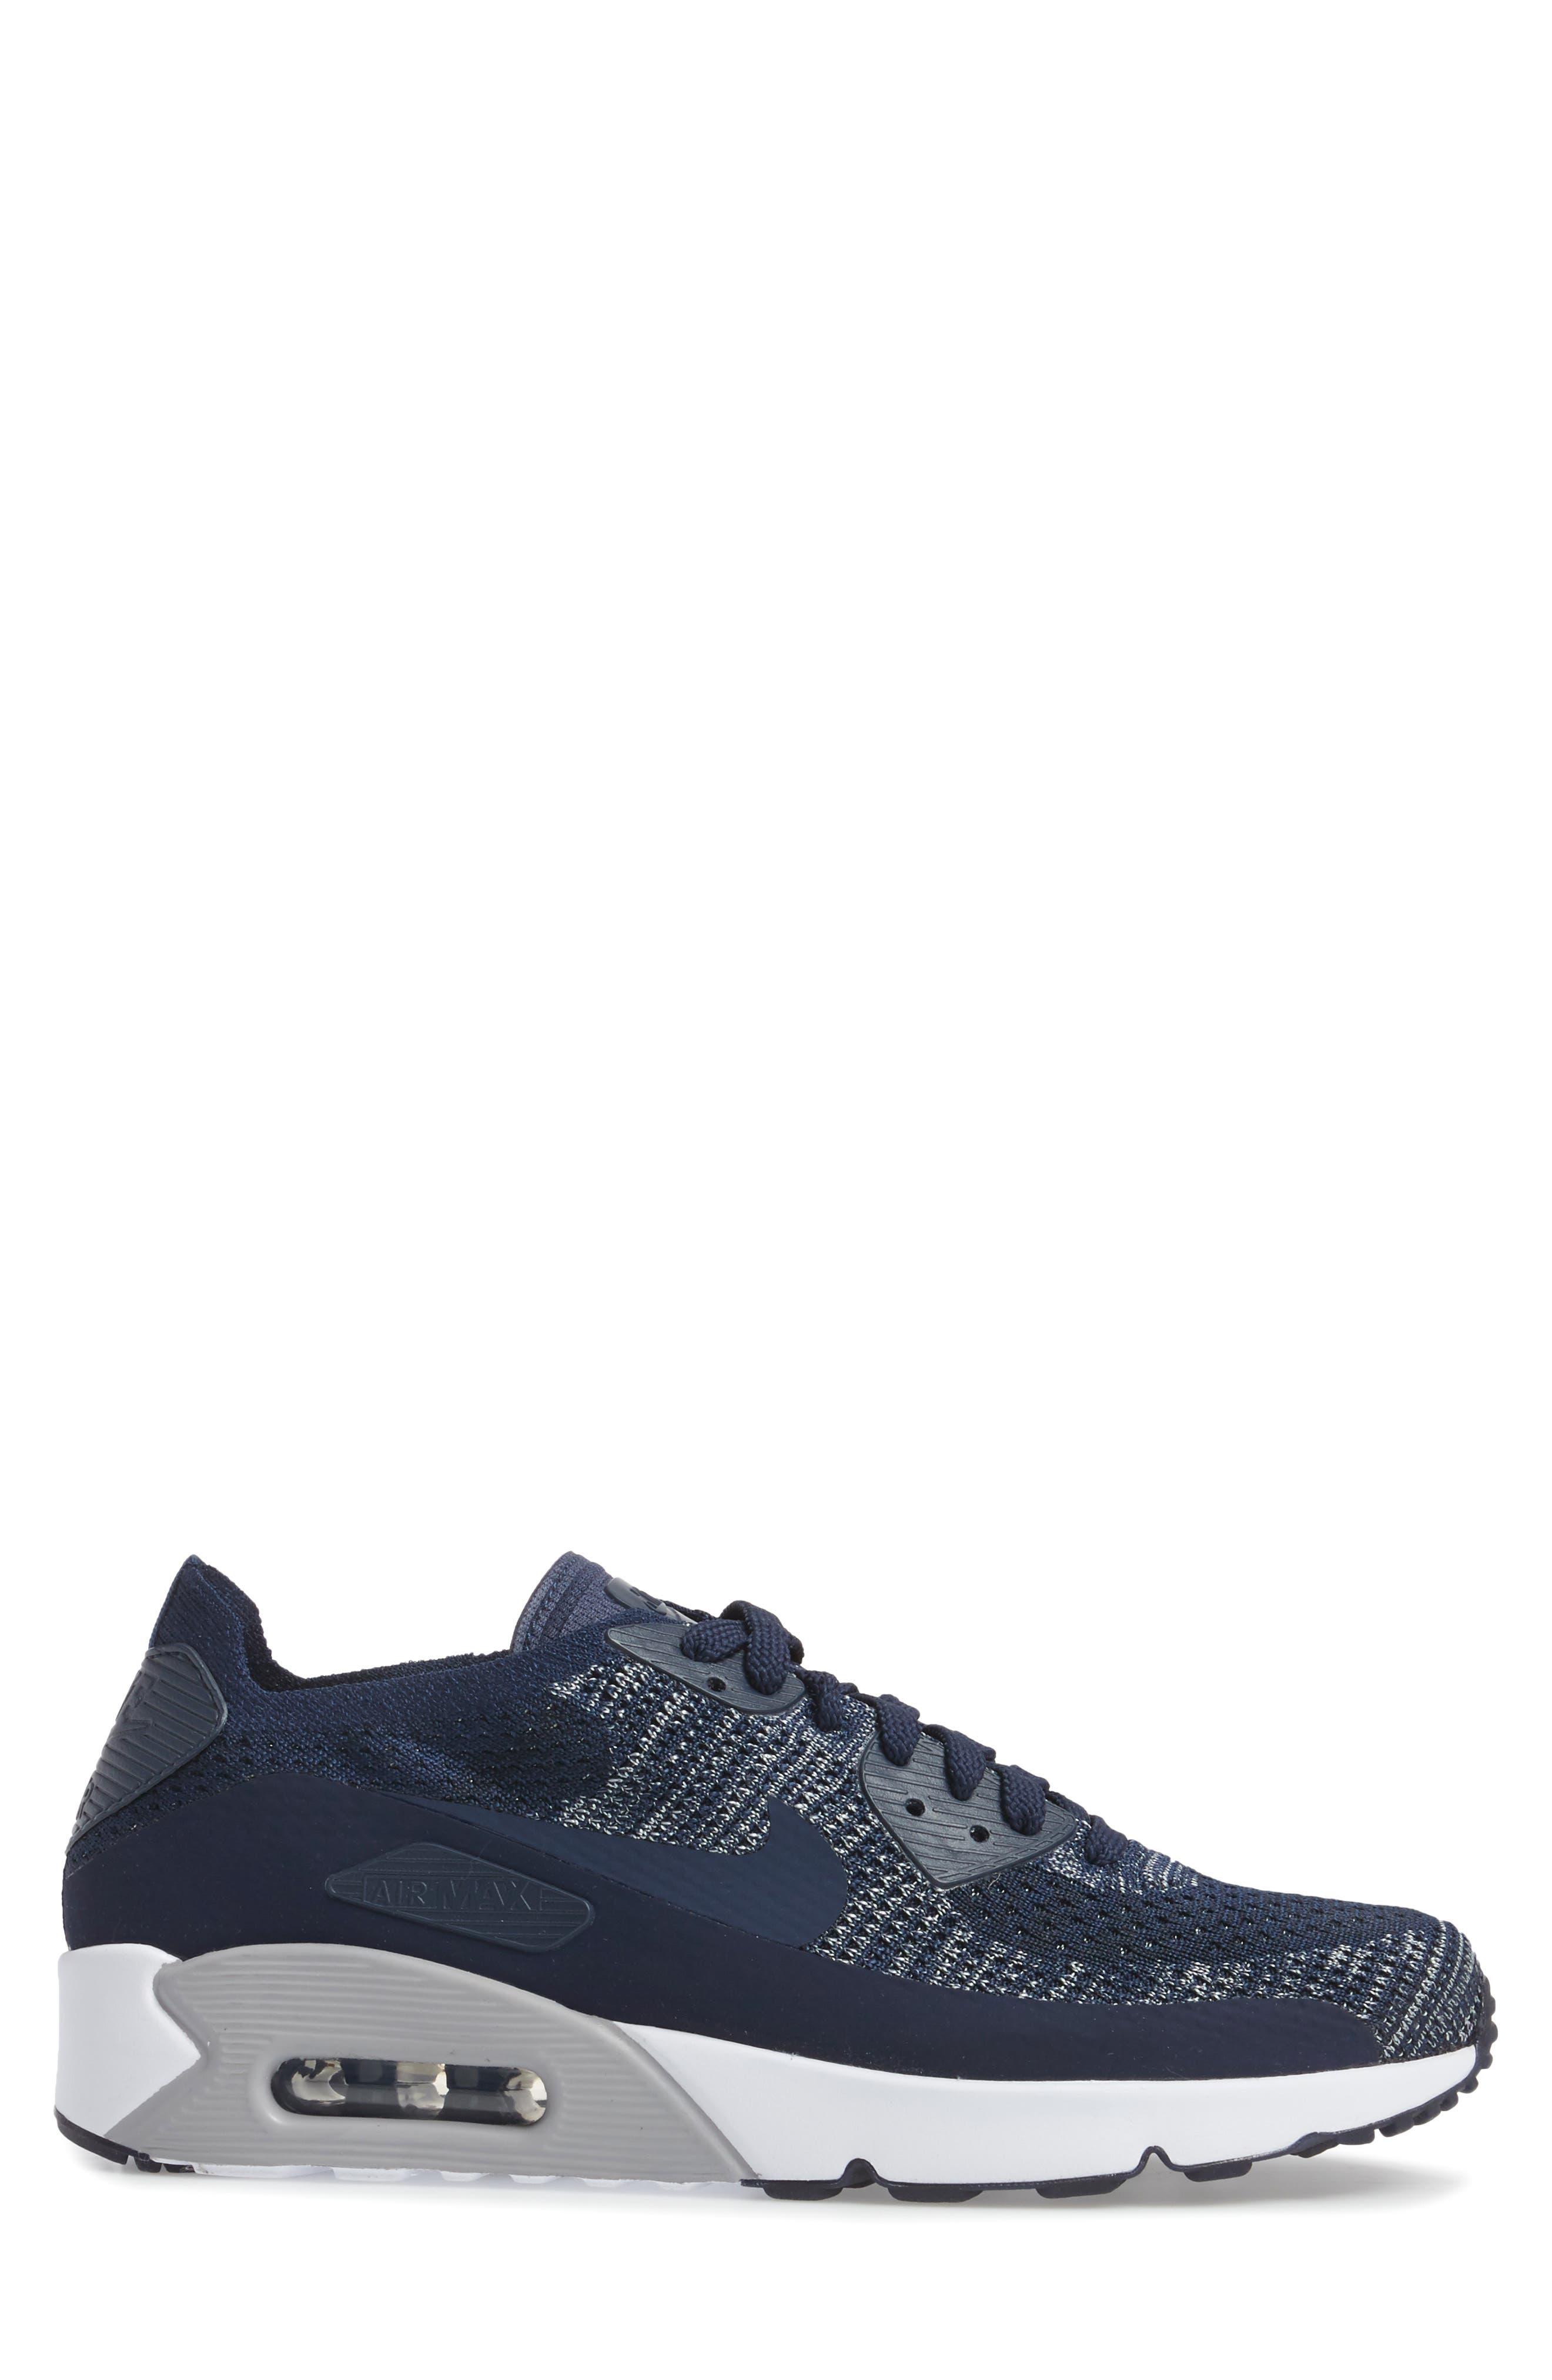 Air Max 90 Ultra 2.0 Flyknit Sneaker,                             Alternate thumbnail 3, color,                             Navy/ Navy/ Grey